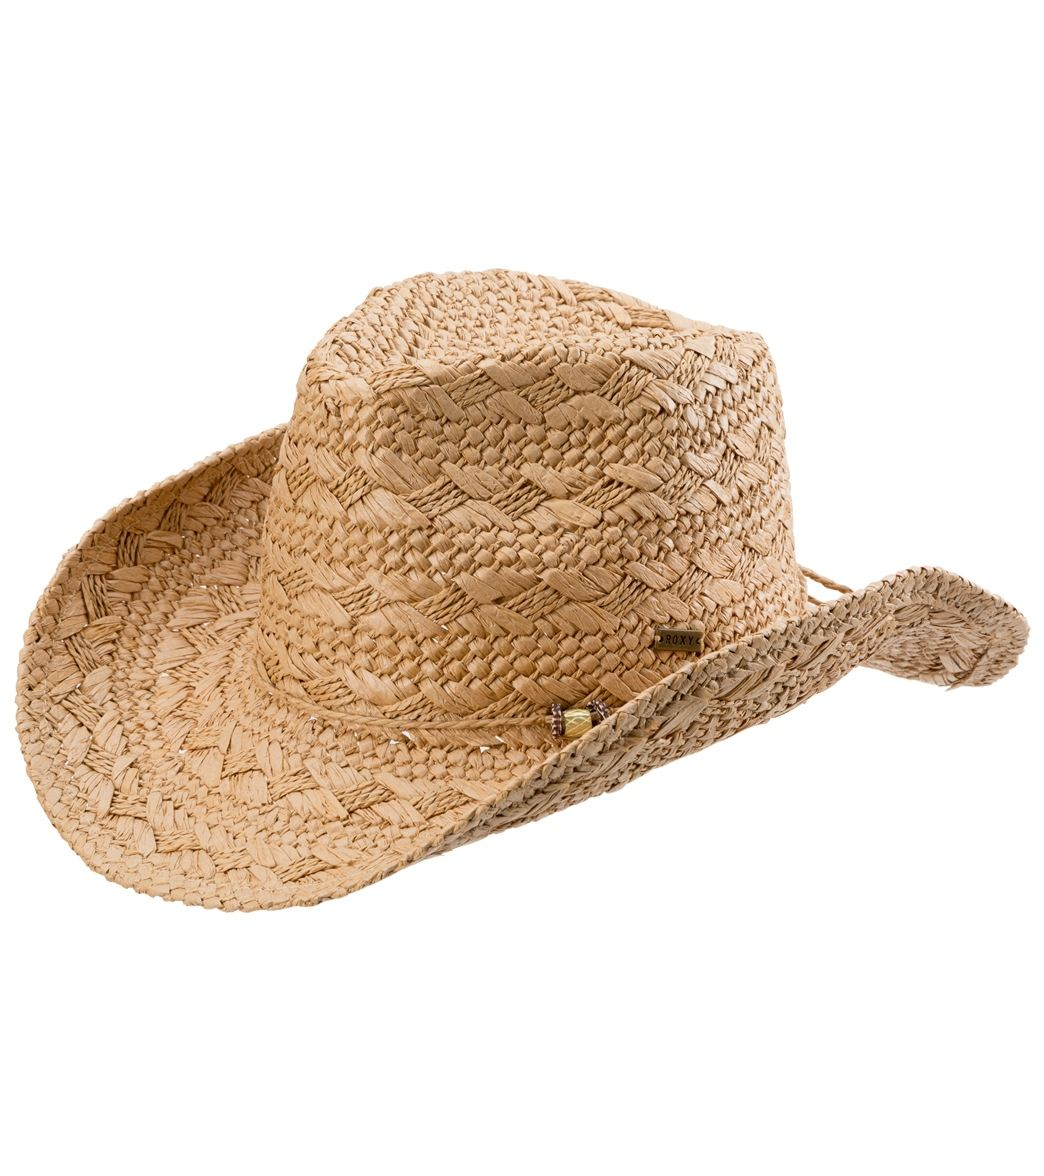 77199eb69f742 Roxy Cowgirl Hat at SwimOutlet.com